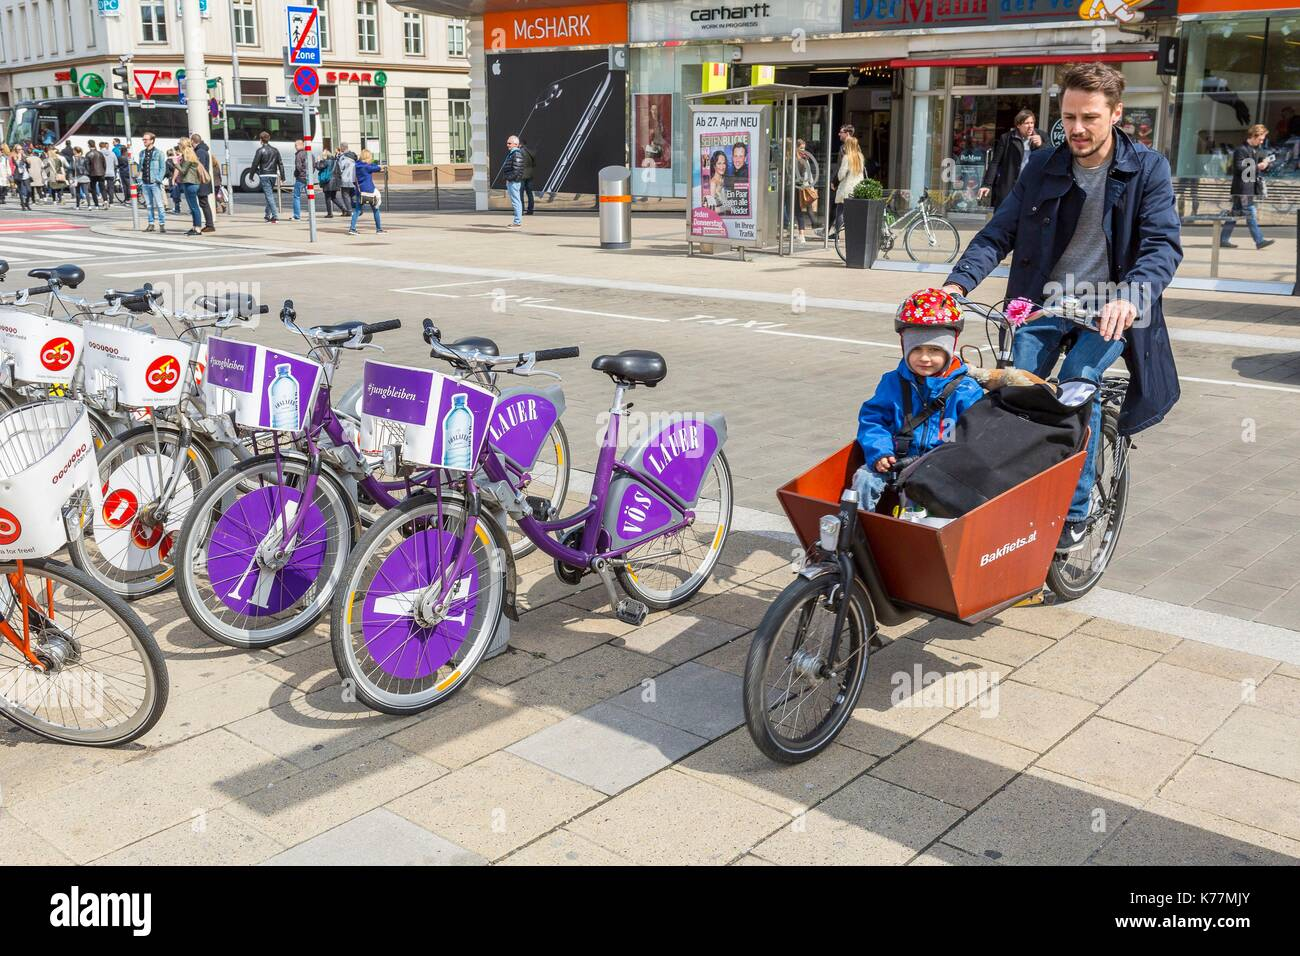 Österreich, Wien, Altstadt zum Weltkulturerbe der UNESCO, Fahrradverleih self-service Stockbild